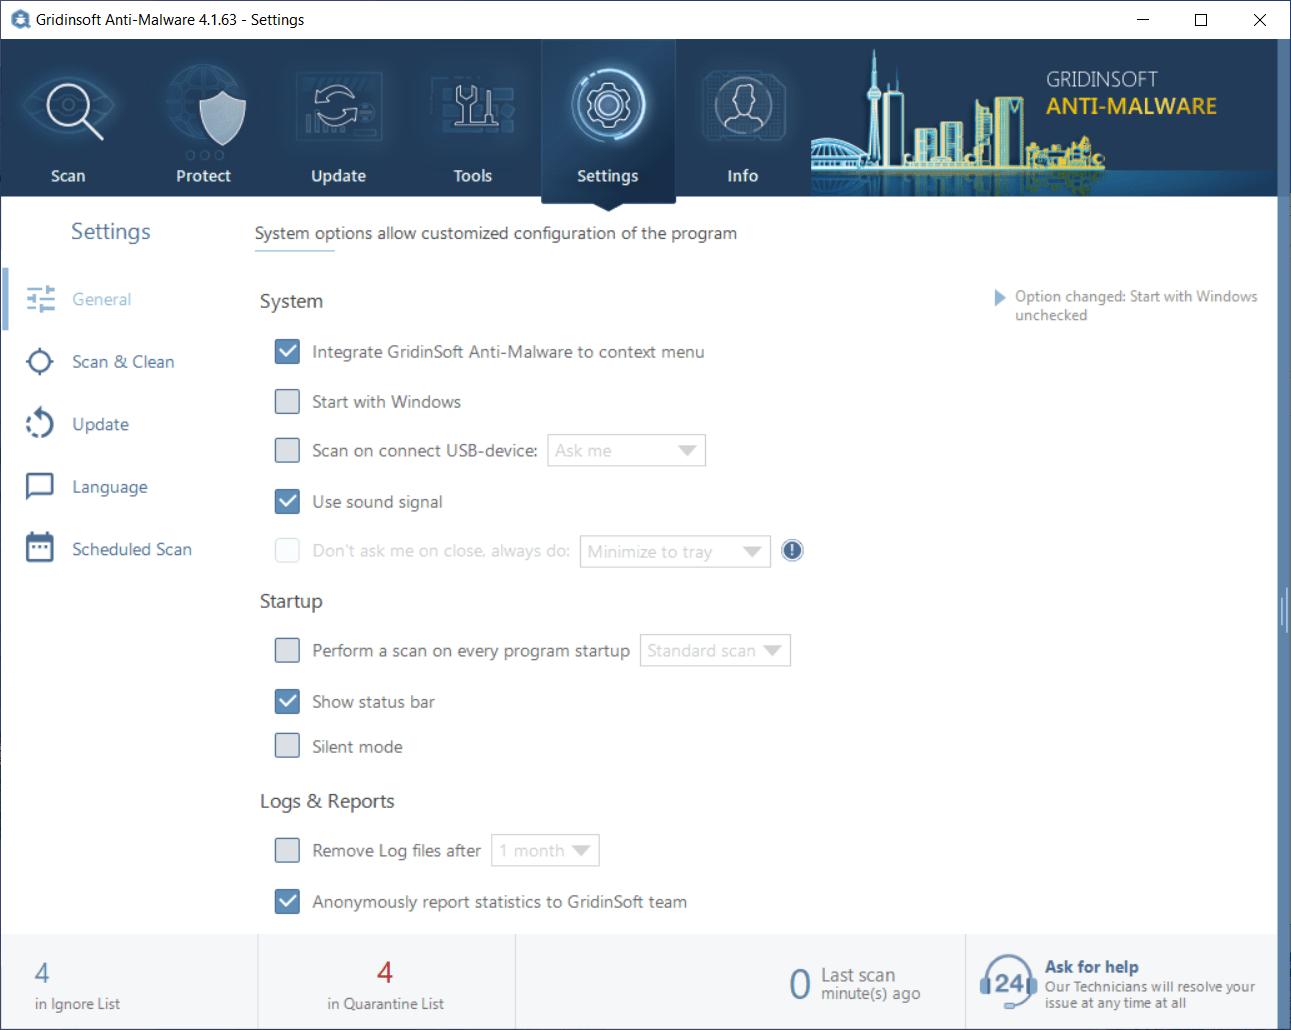 GridinSoft Anti-Malware general settings